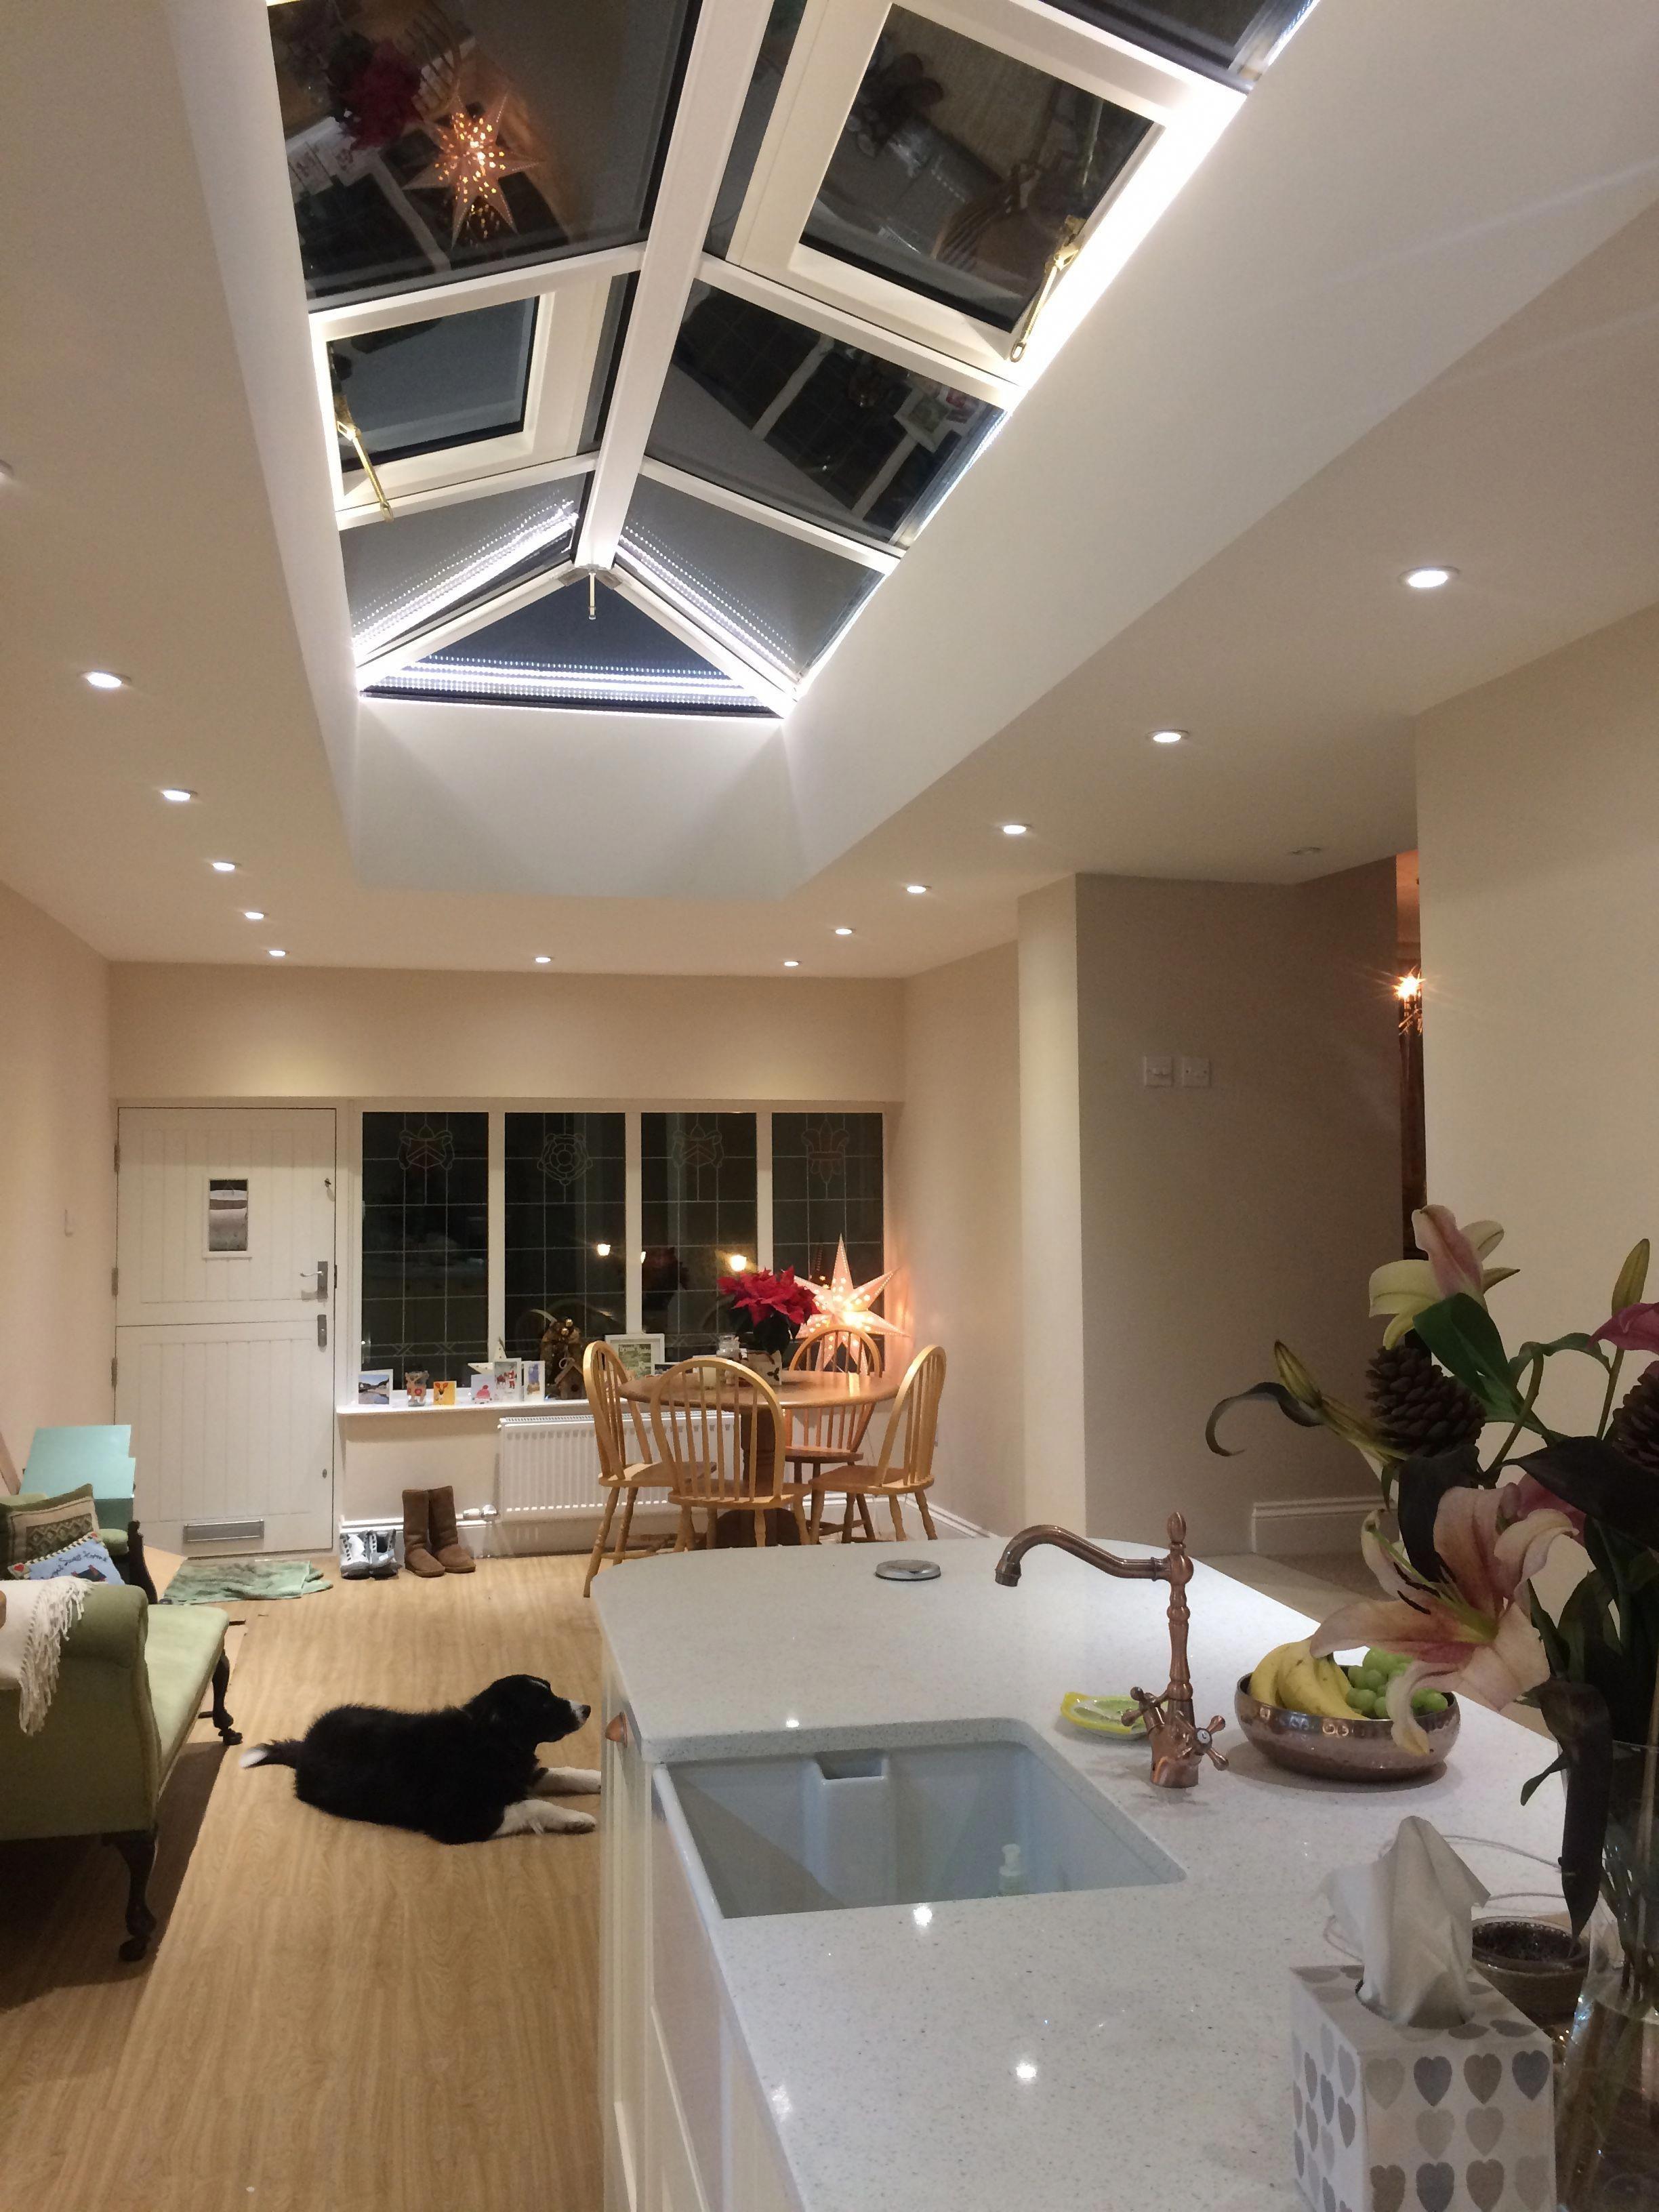 Home Decorating Tips And Tricks Interiorledlights Roofingtipstricks Ceiling Light Design Lighting Design Interior Roof Lantern